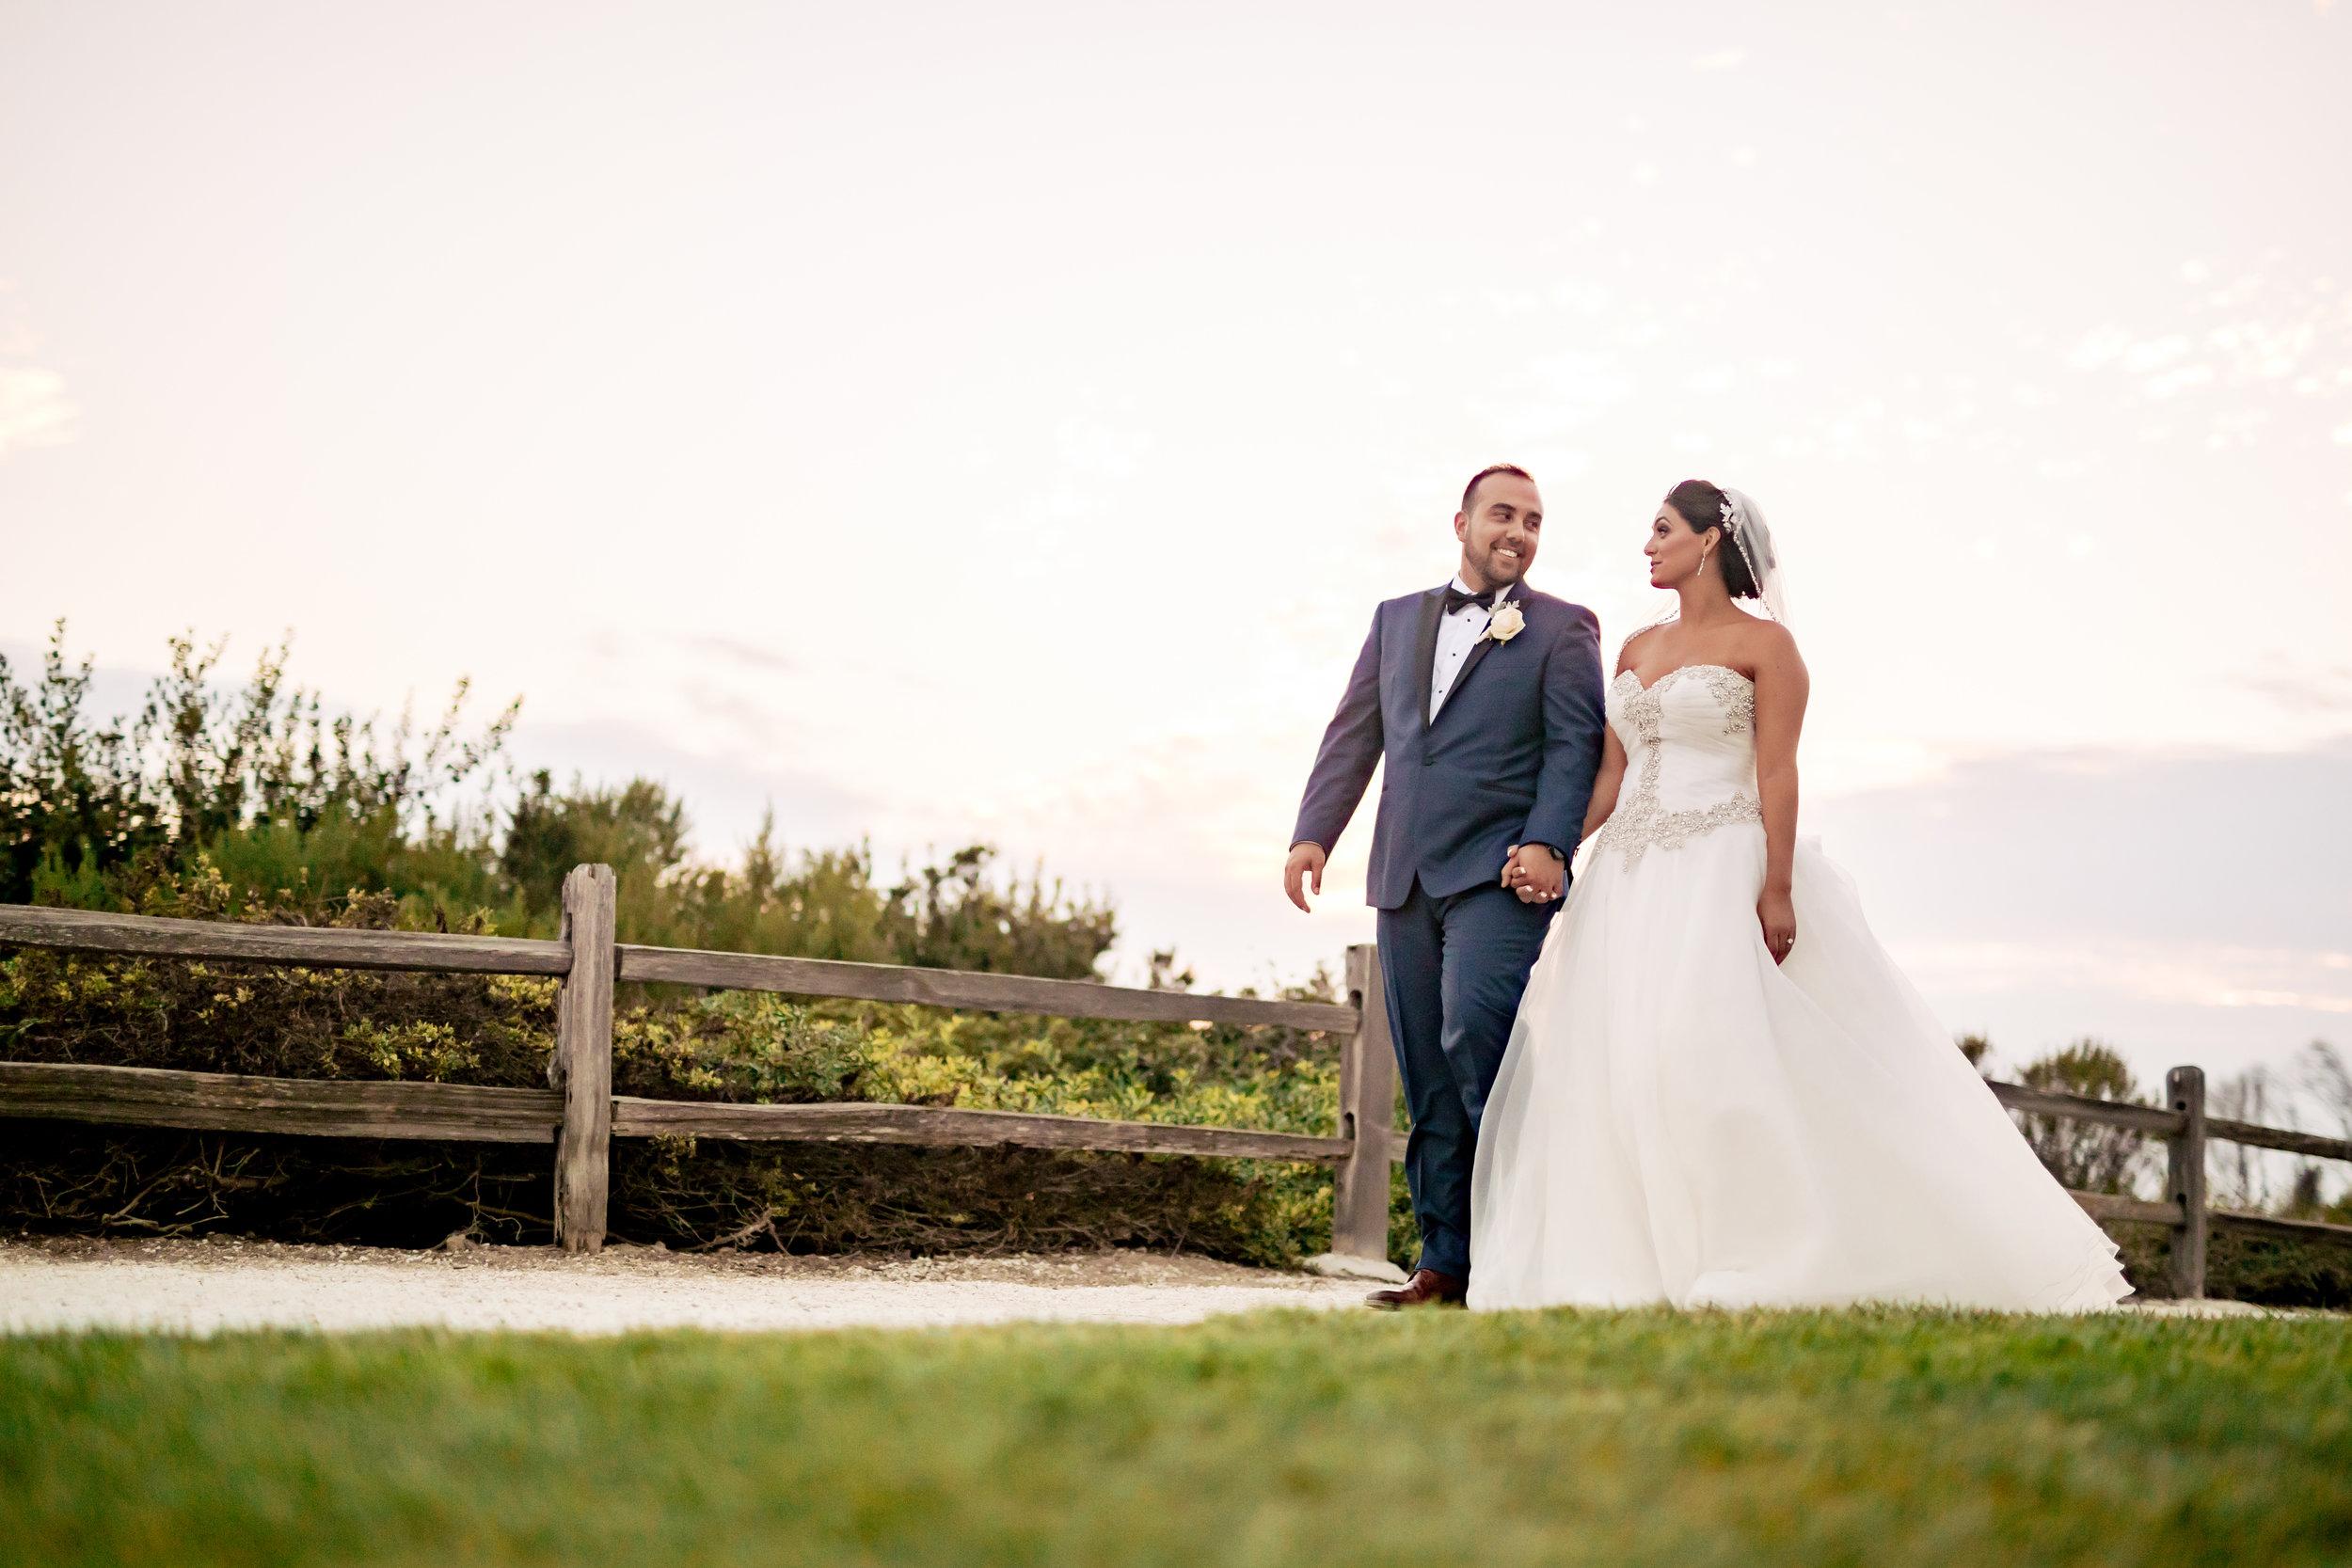 www.santabarbarawedding.com | Bacara Resort | Rewind Photography | Elegant Sofreh Design | Bride and Groom